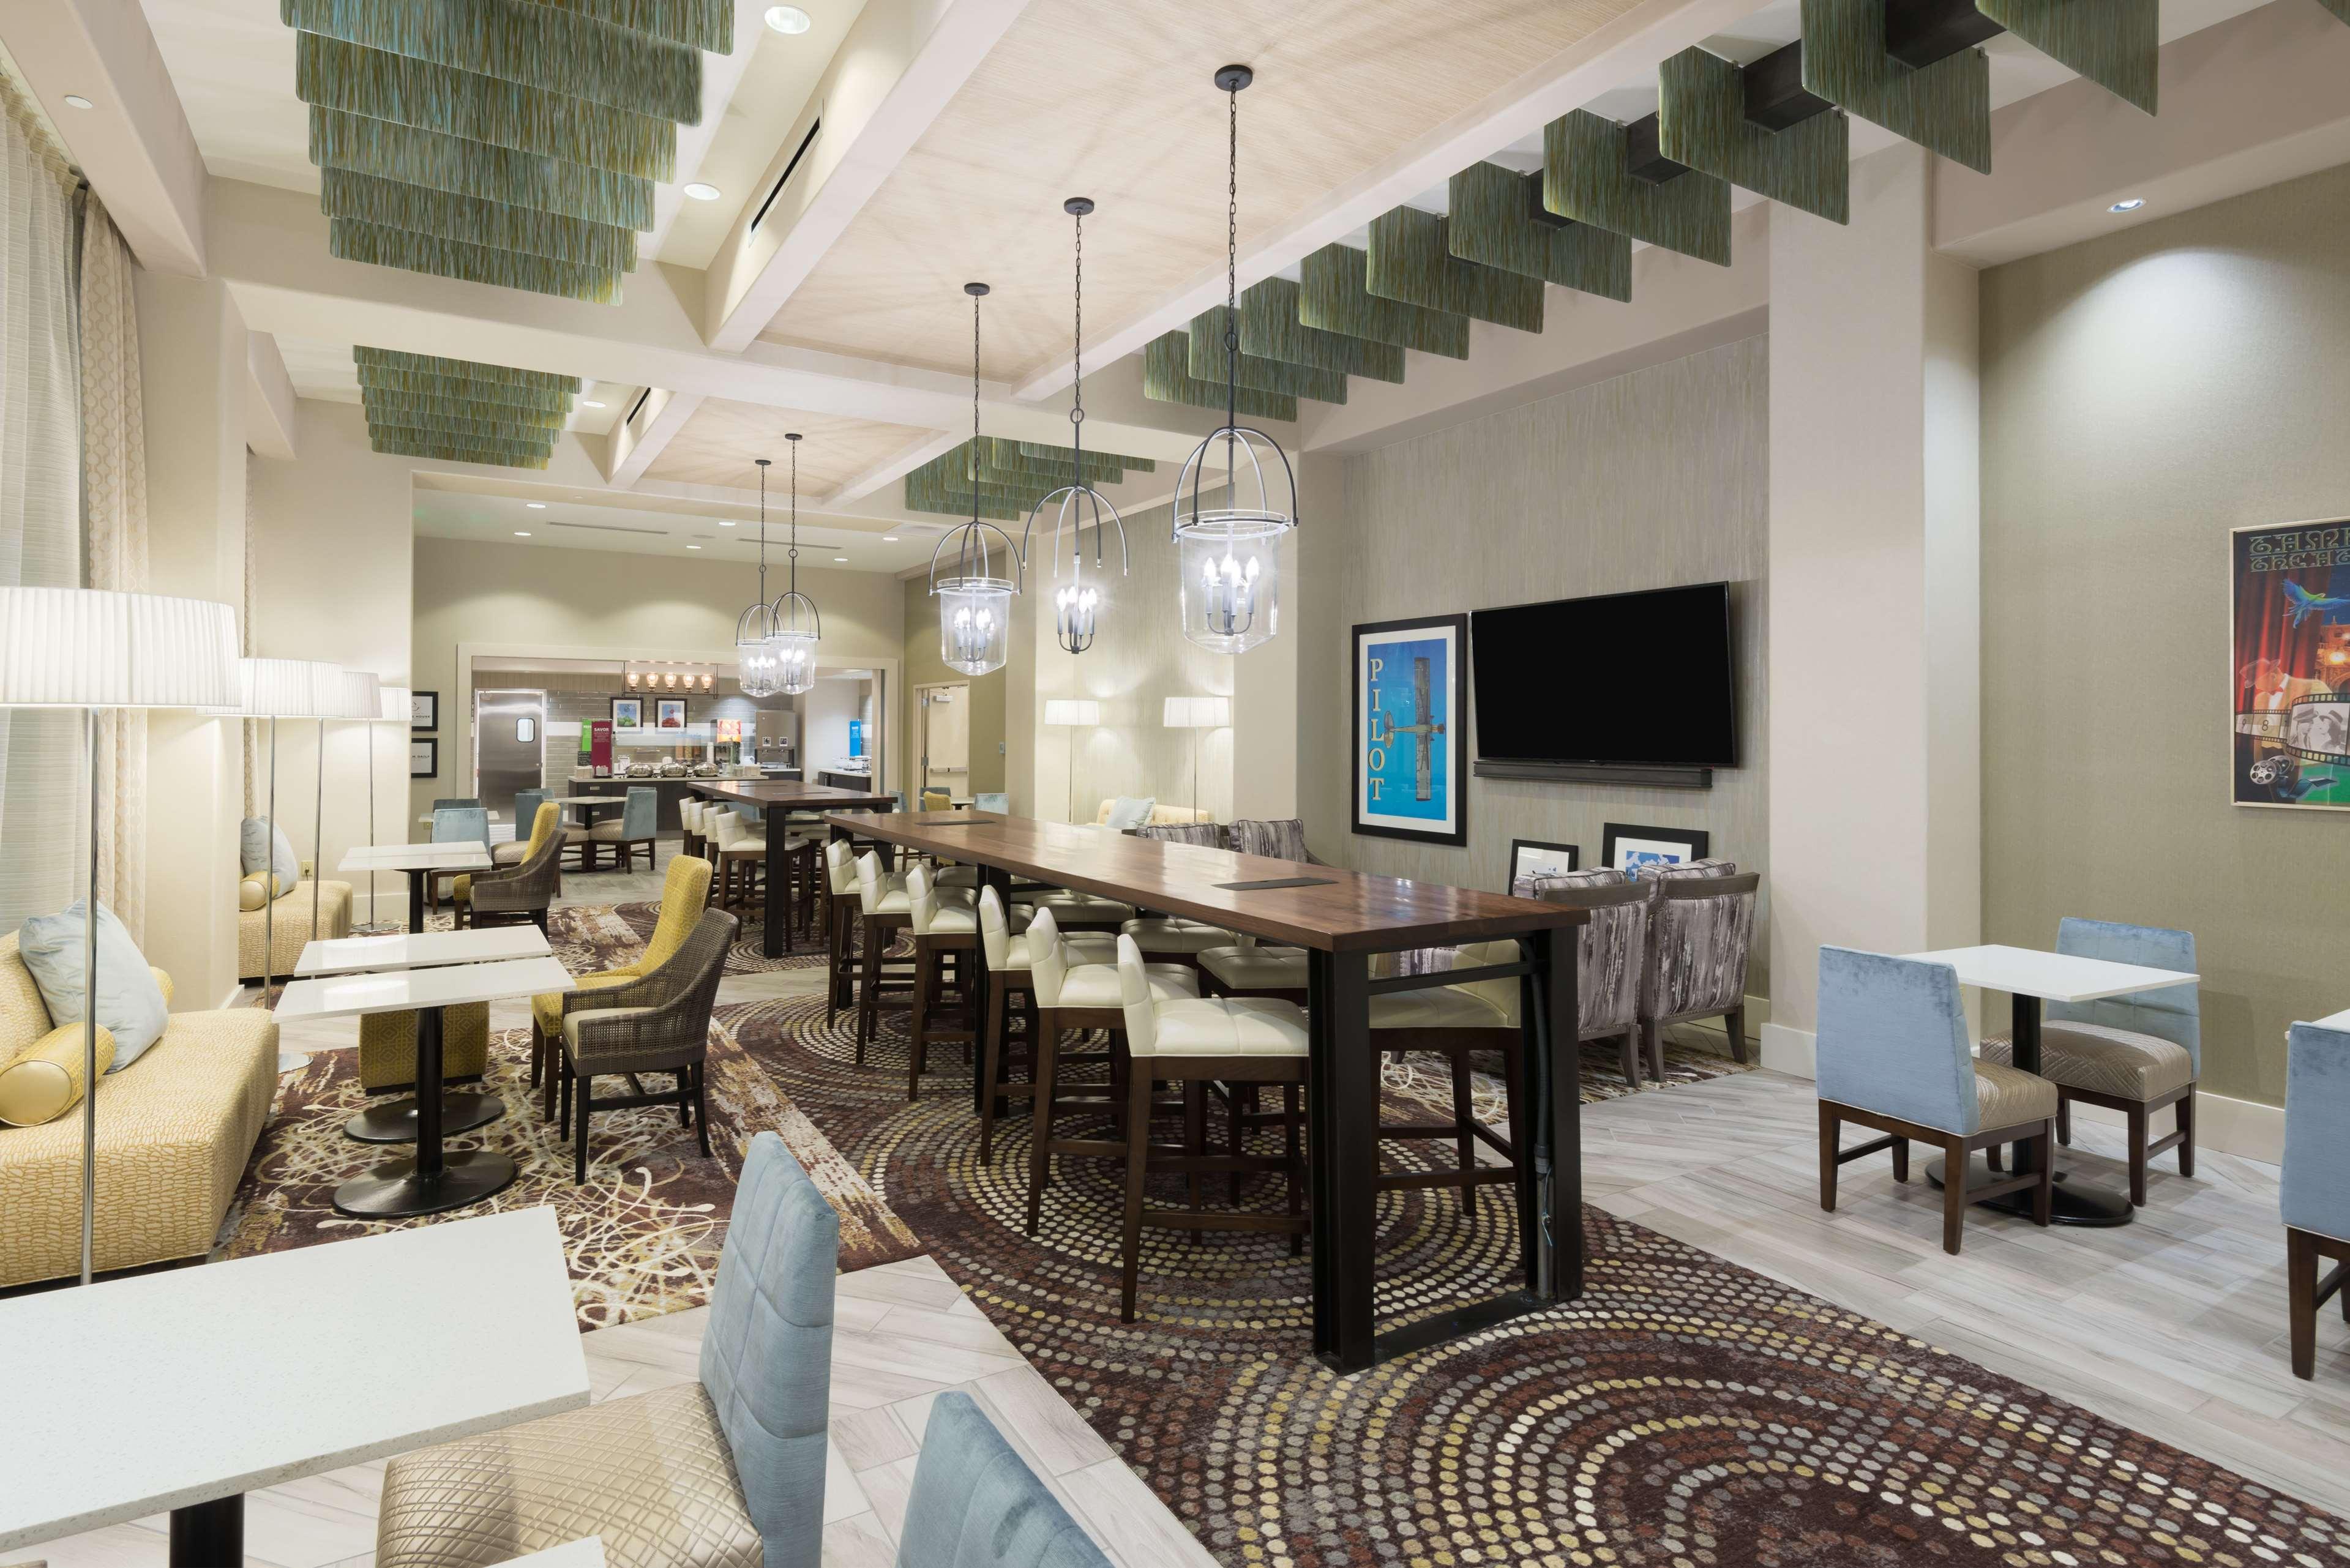 Hampton Inn & Suites Tampa Airport Avion Park Westshore image 5